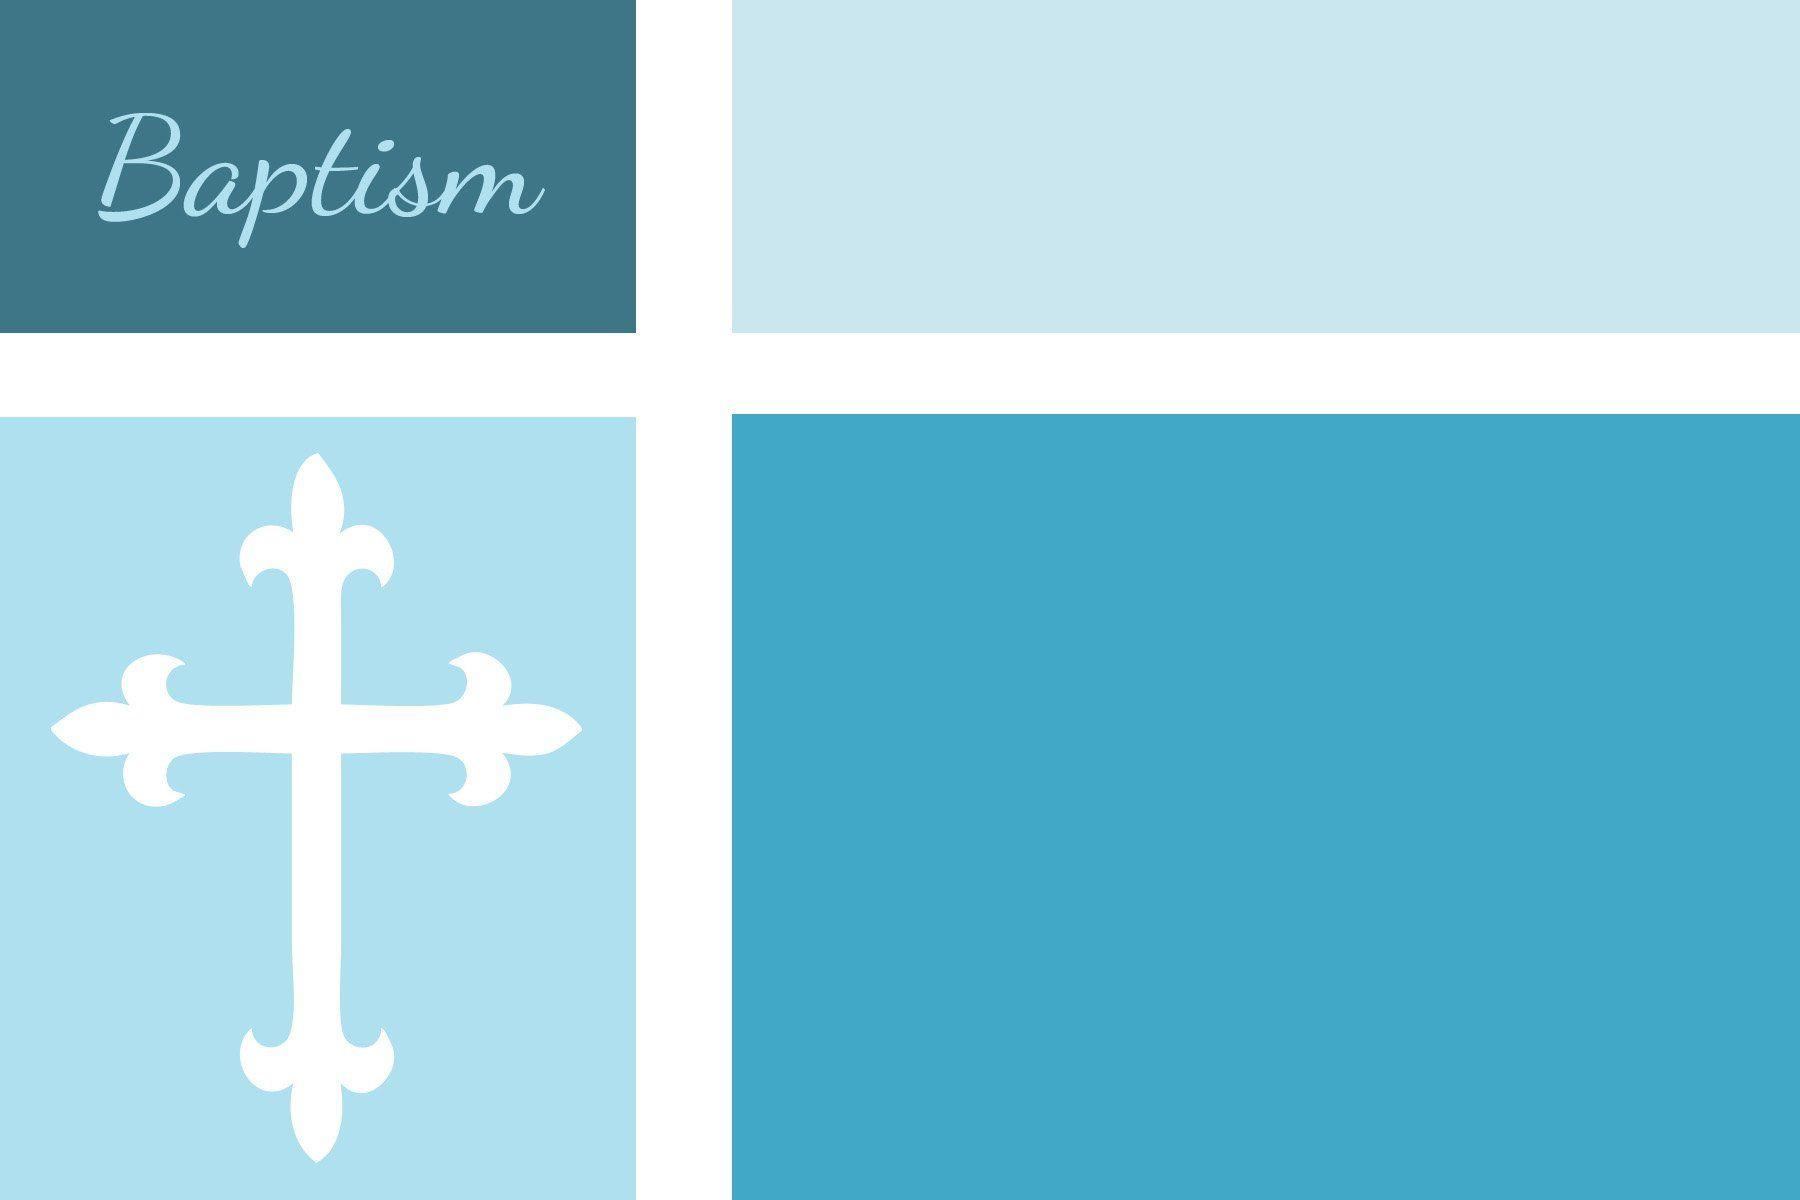 Free Printable Baptism Invitations Templates Best Baptism Invitation - Free Printable Baptism Invitations